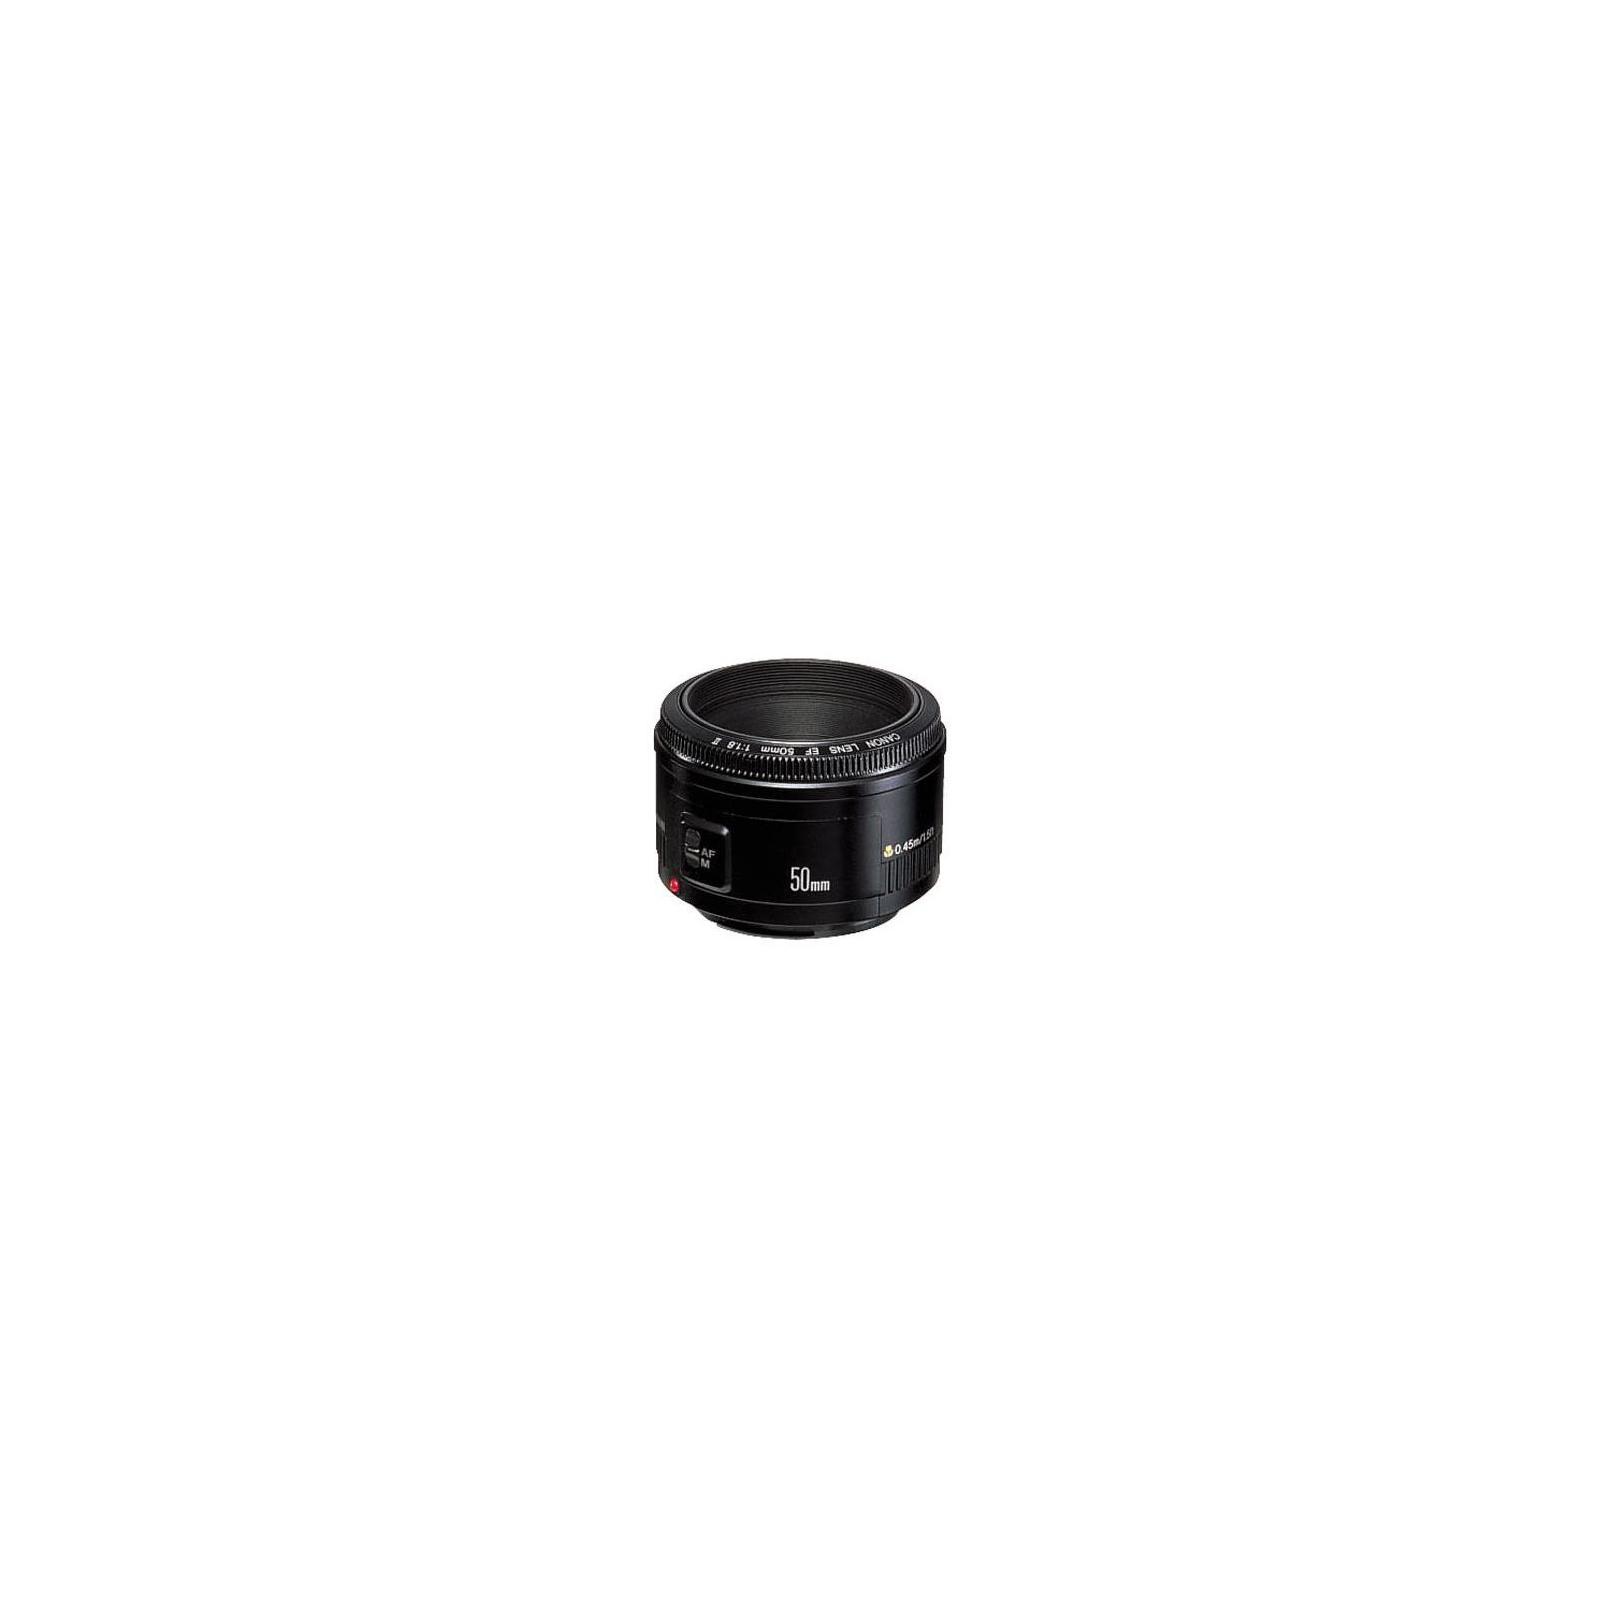 Объектив EF 50mm f/1.8 II Canon (2514A011)